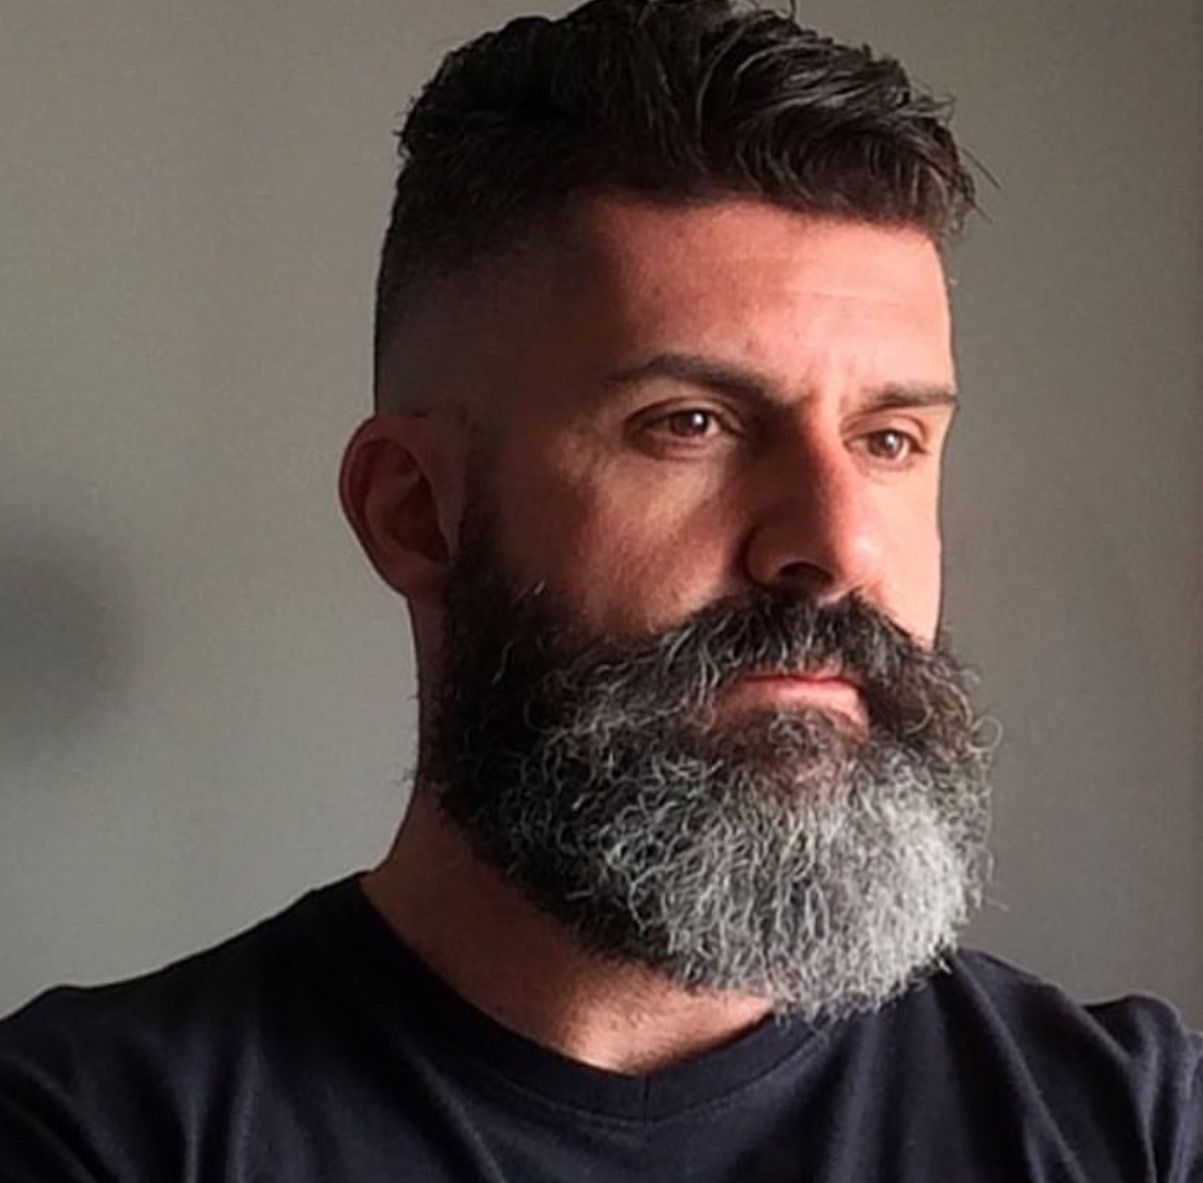 Mens Hairstyle And Beard Pinanu Lavonen On Beards  Pinterest  Beard Styles Short Beard